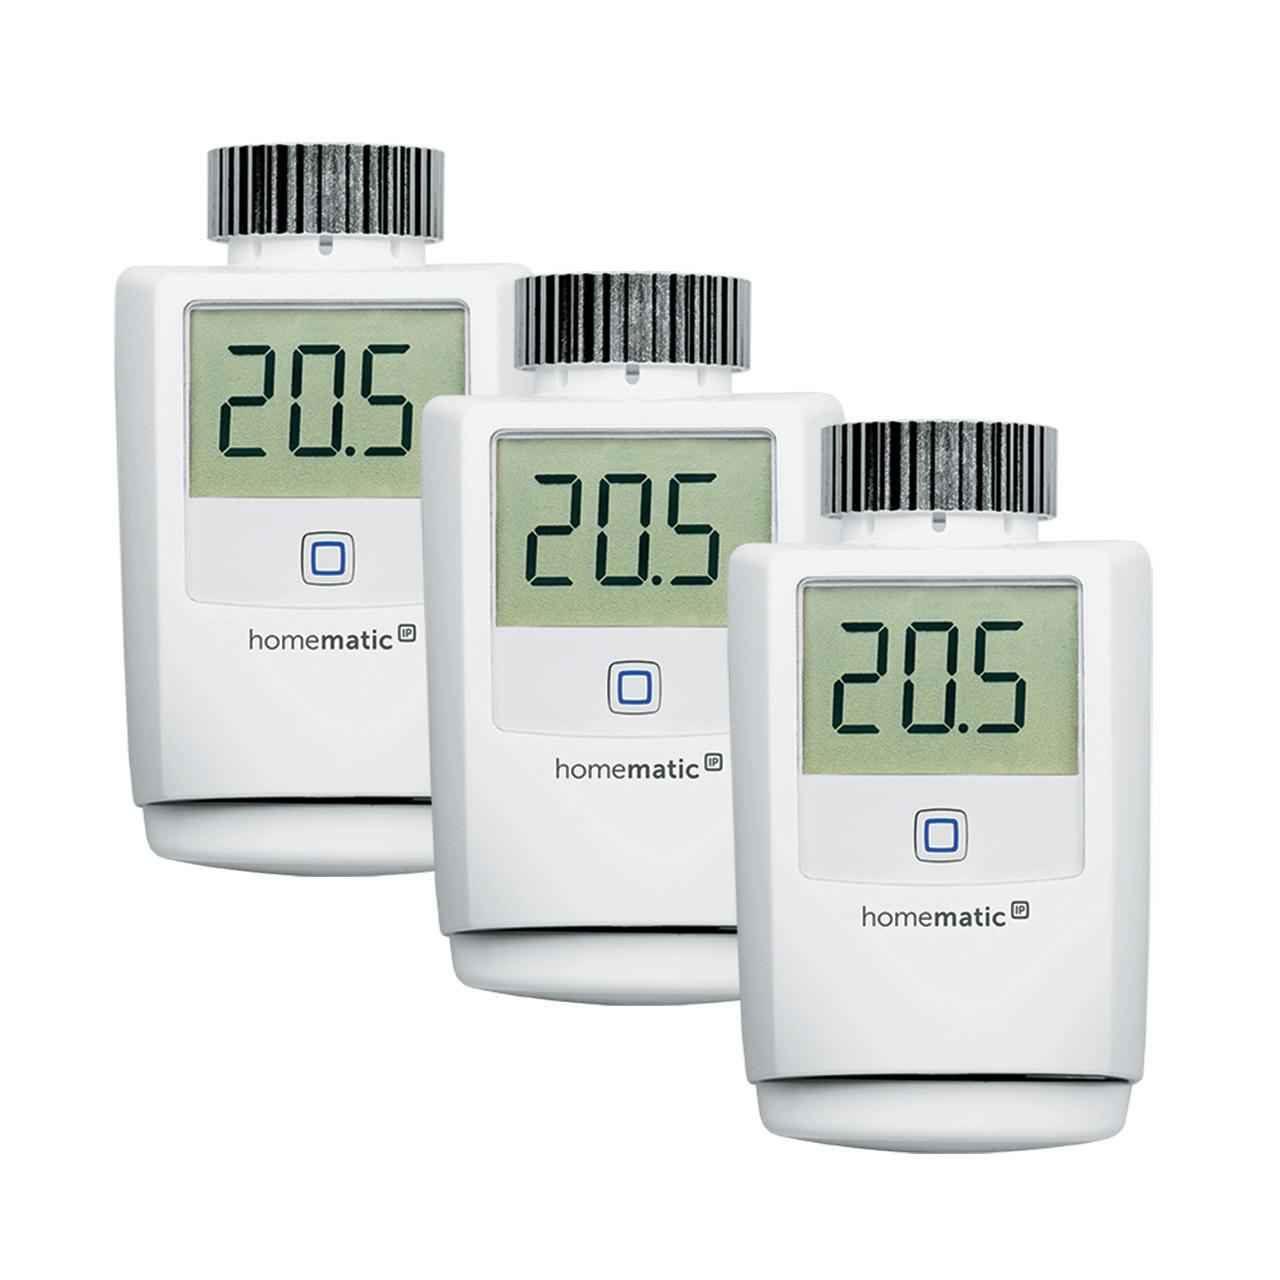 Homematic IP 3er Set Heizkörperthermostat HMIP-eTRV-2 für Smart Home - Hausautomation